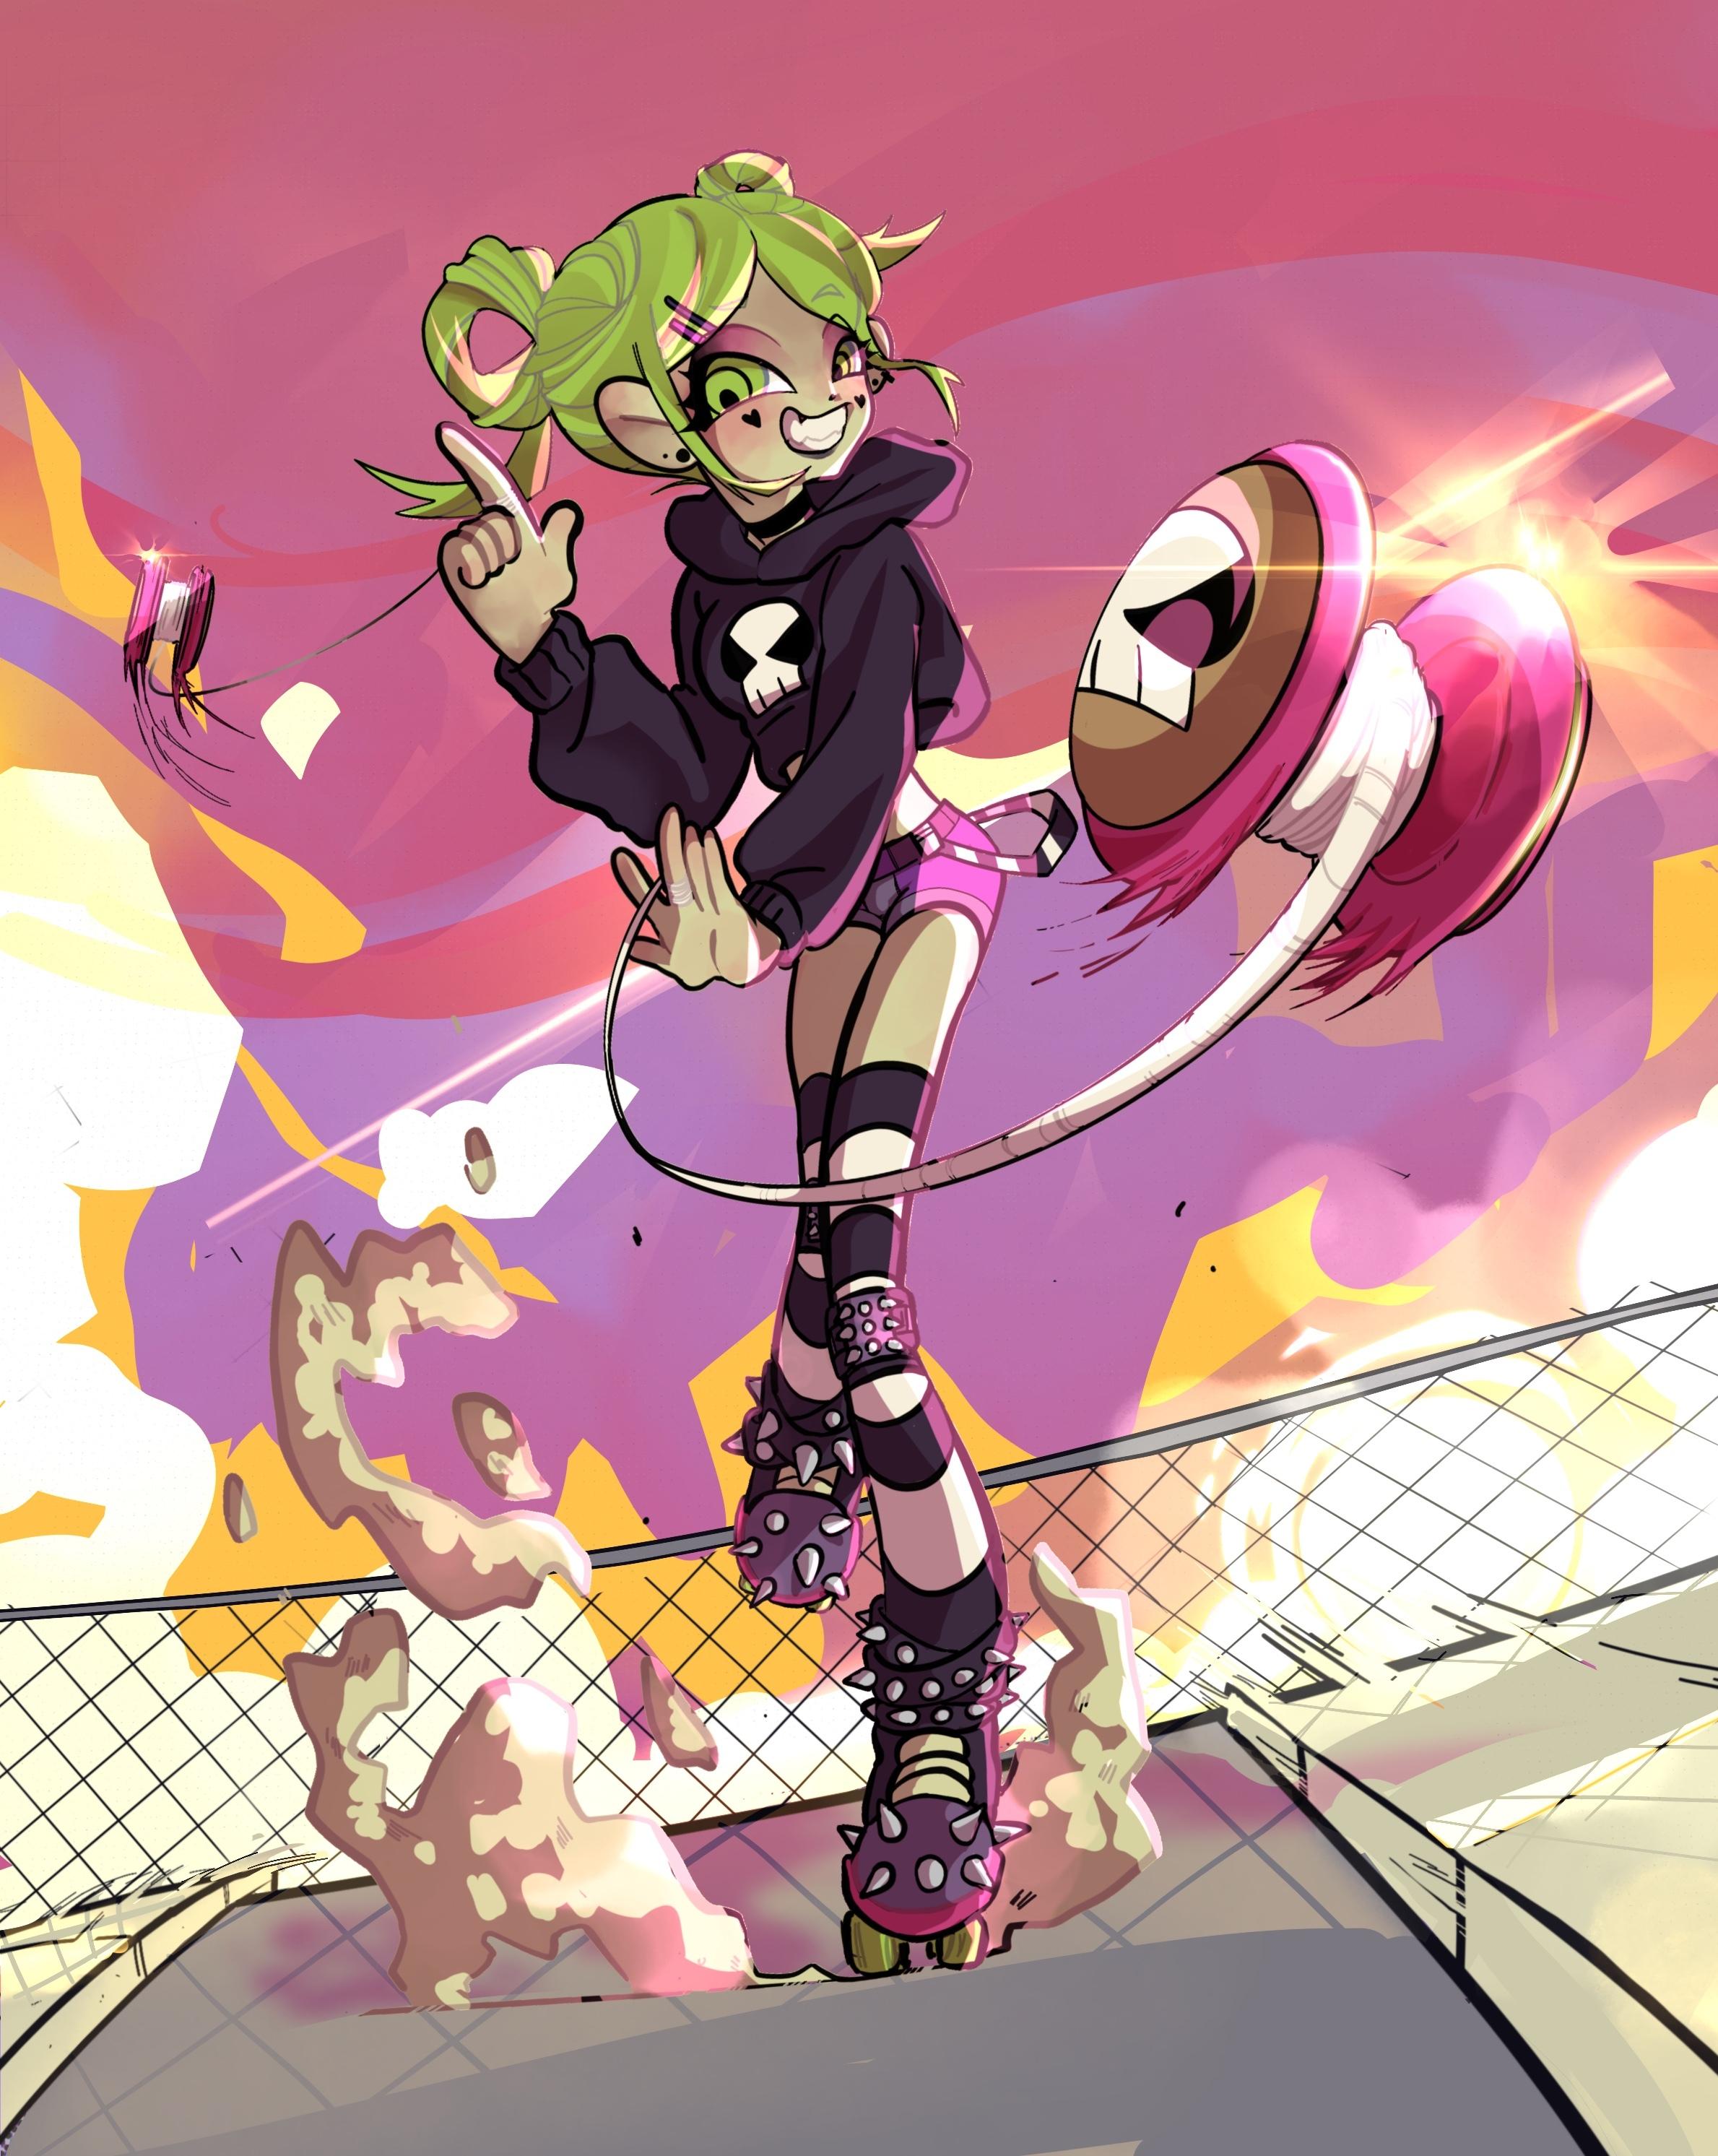 Roller girl go vrooooommm